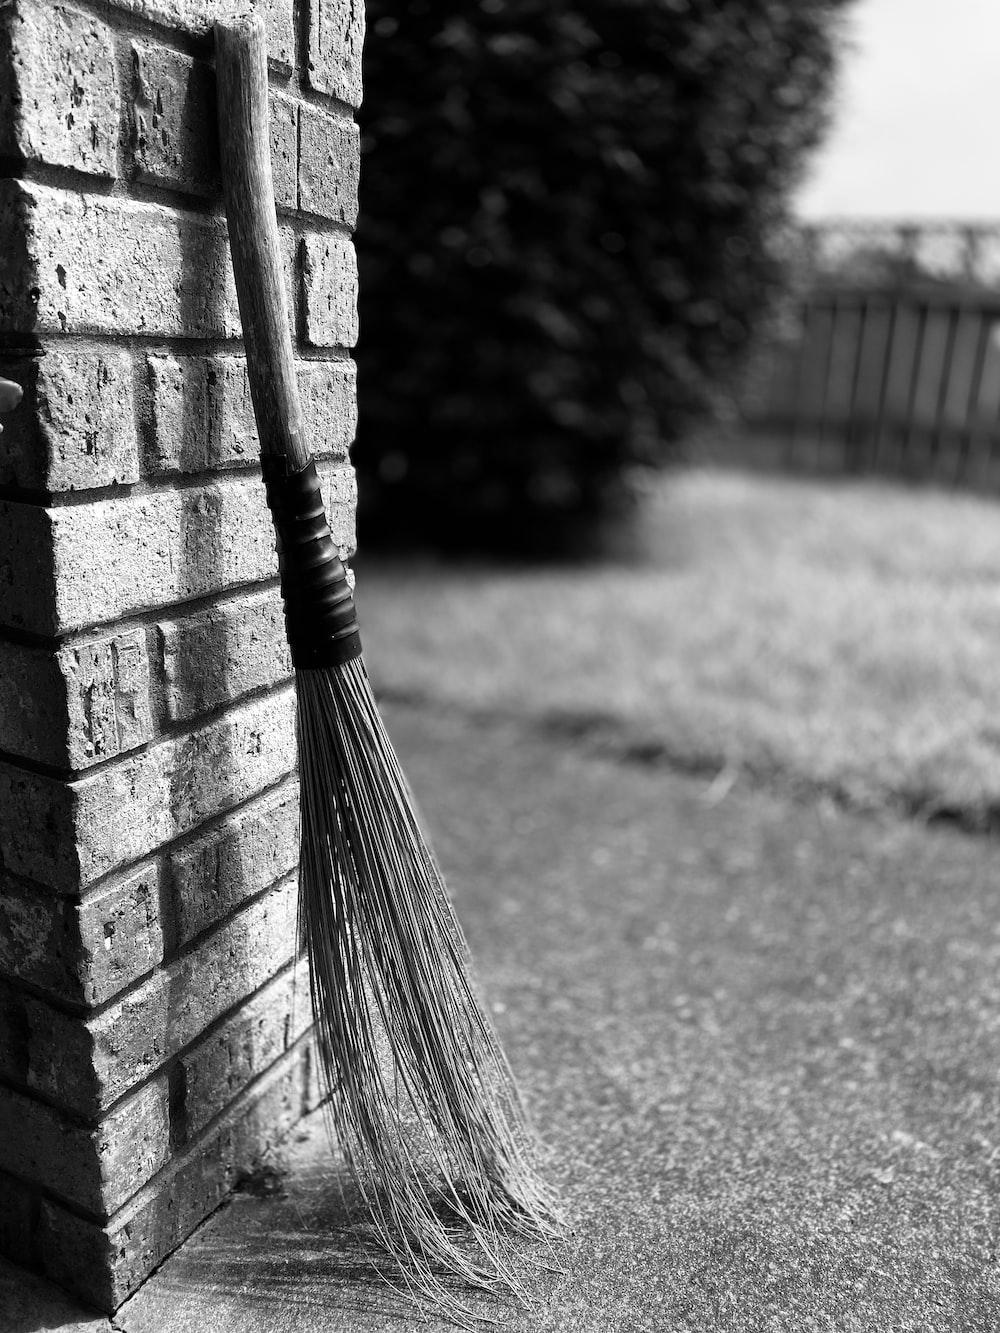 broom place near wall